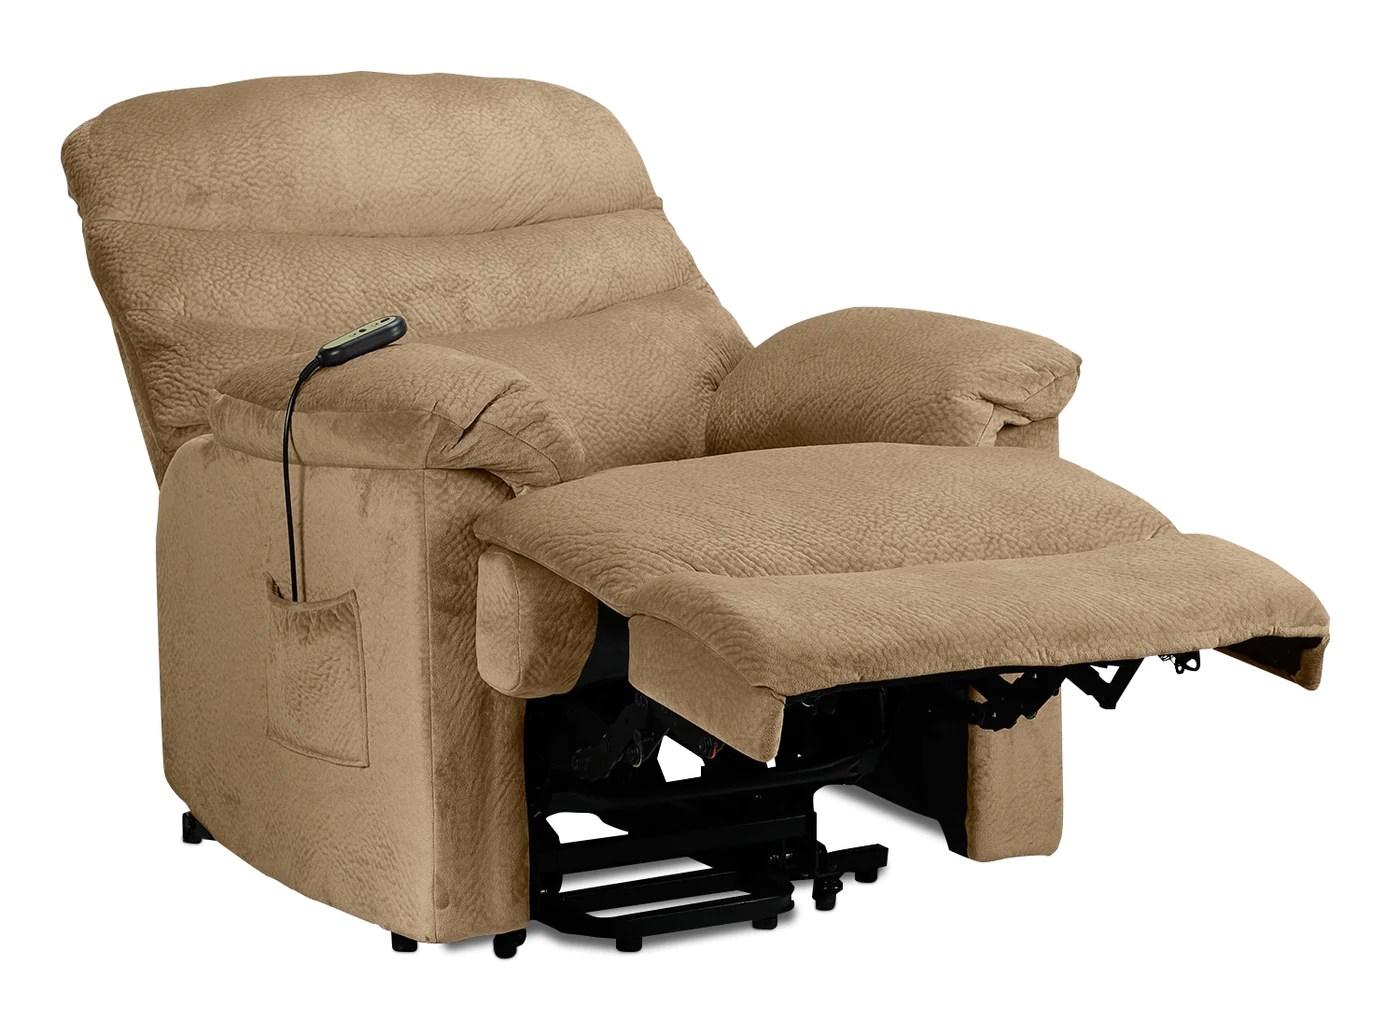 lift chairs edmonton ab rubber chair feet bunnings bradey power recliner camel leon s previous next